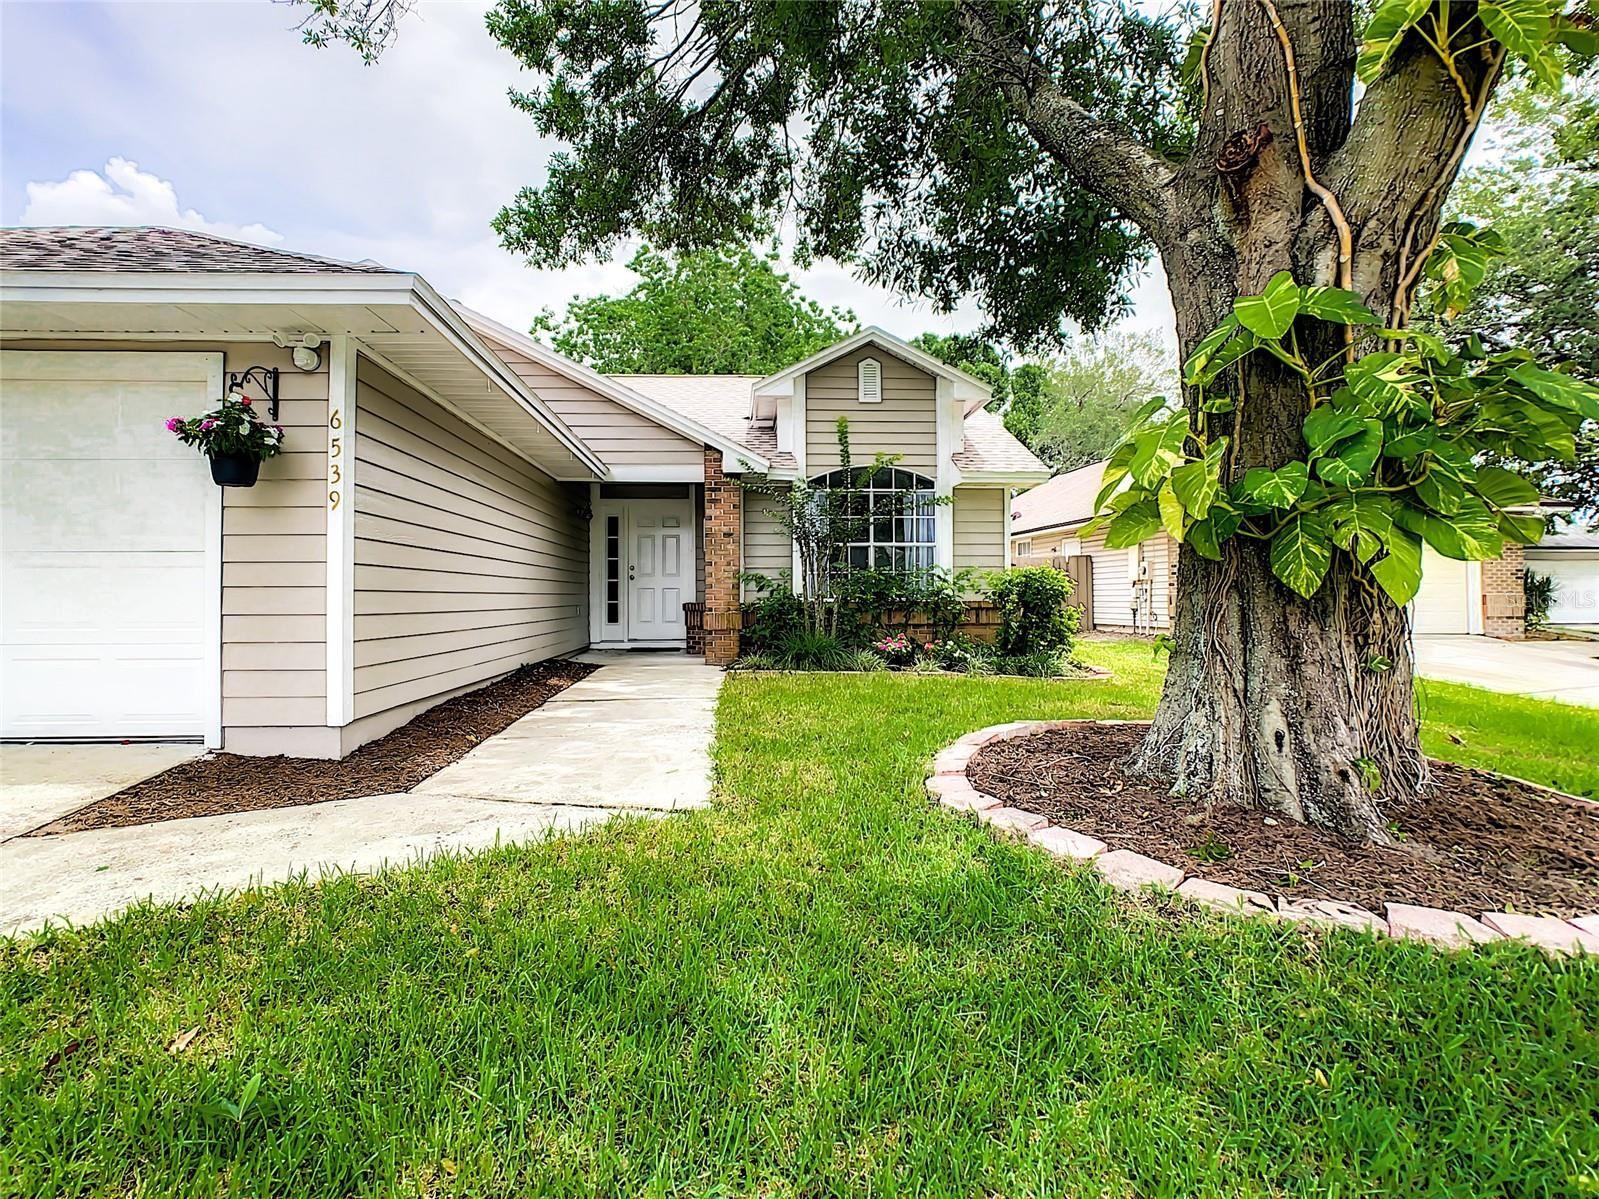 Photo of 6539 PICCADILLY LANE, ORLANDO, FL 32835 (MLS # O5952476)